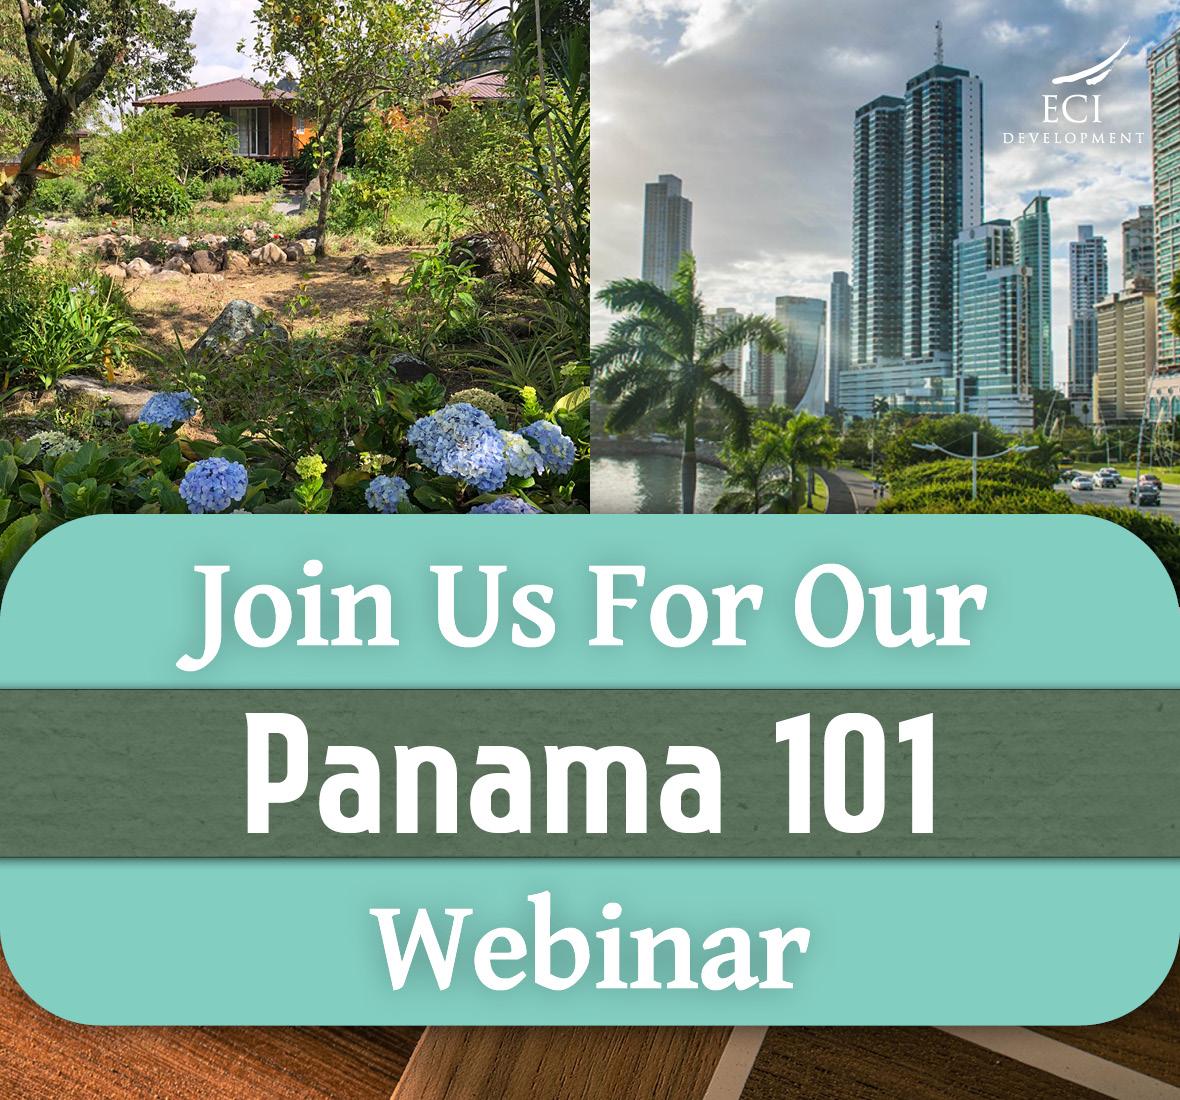 Panama_101_Webinar_A1_-_Join_Us